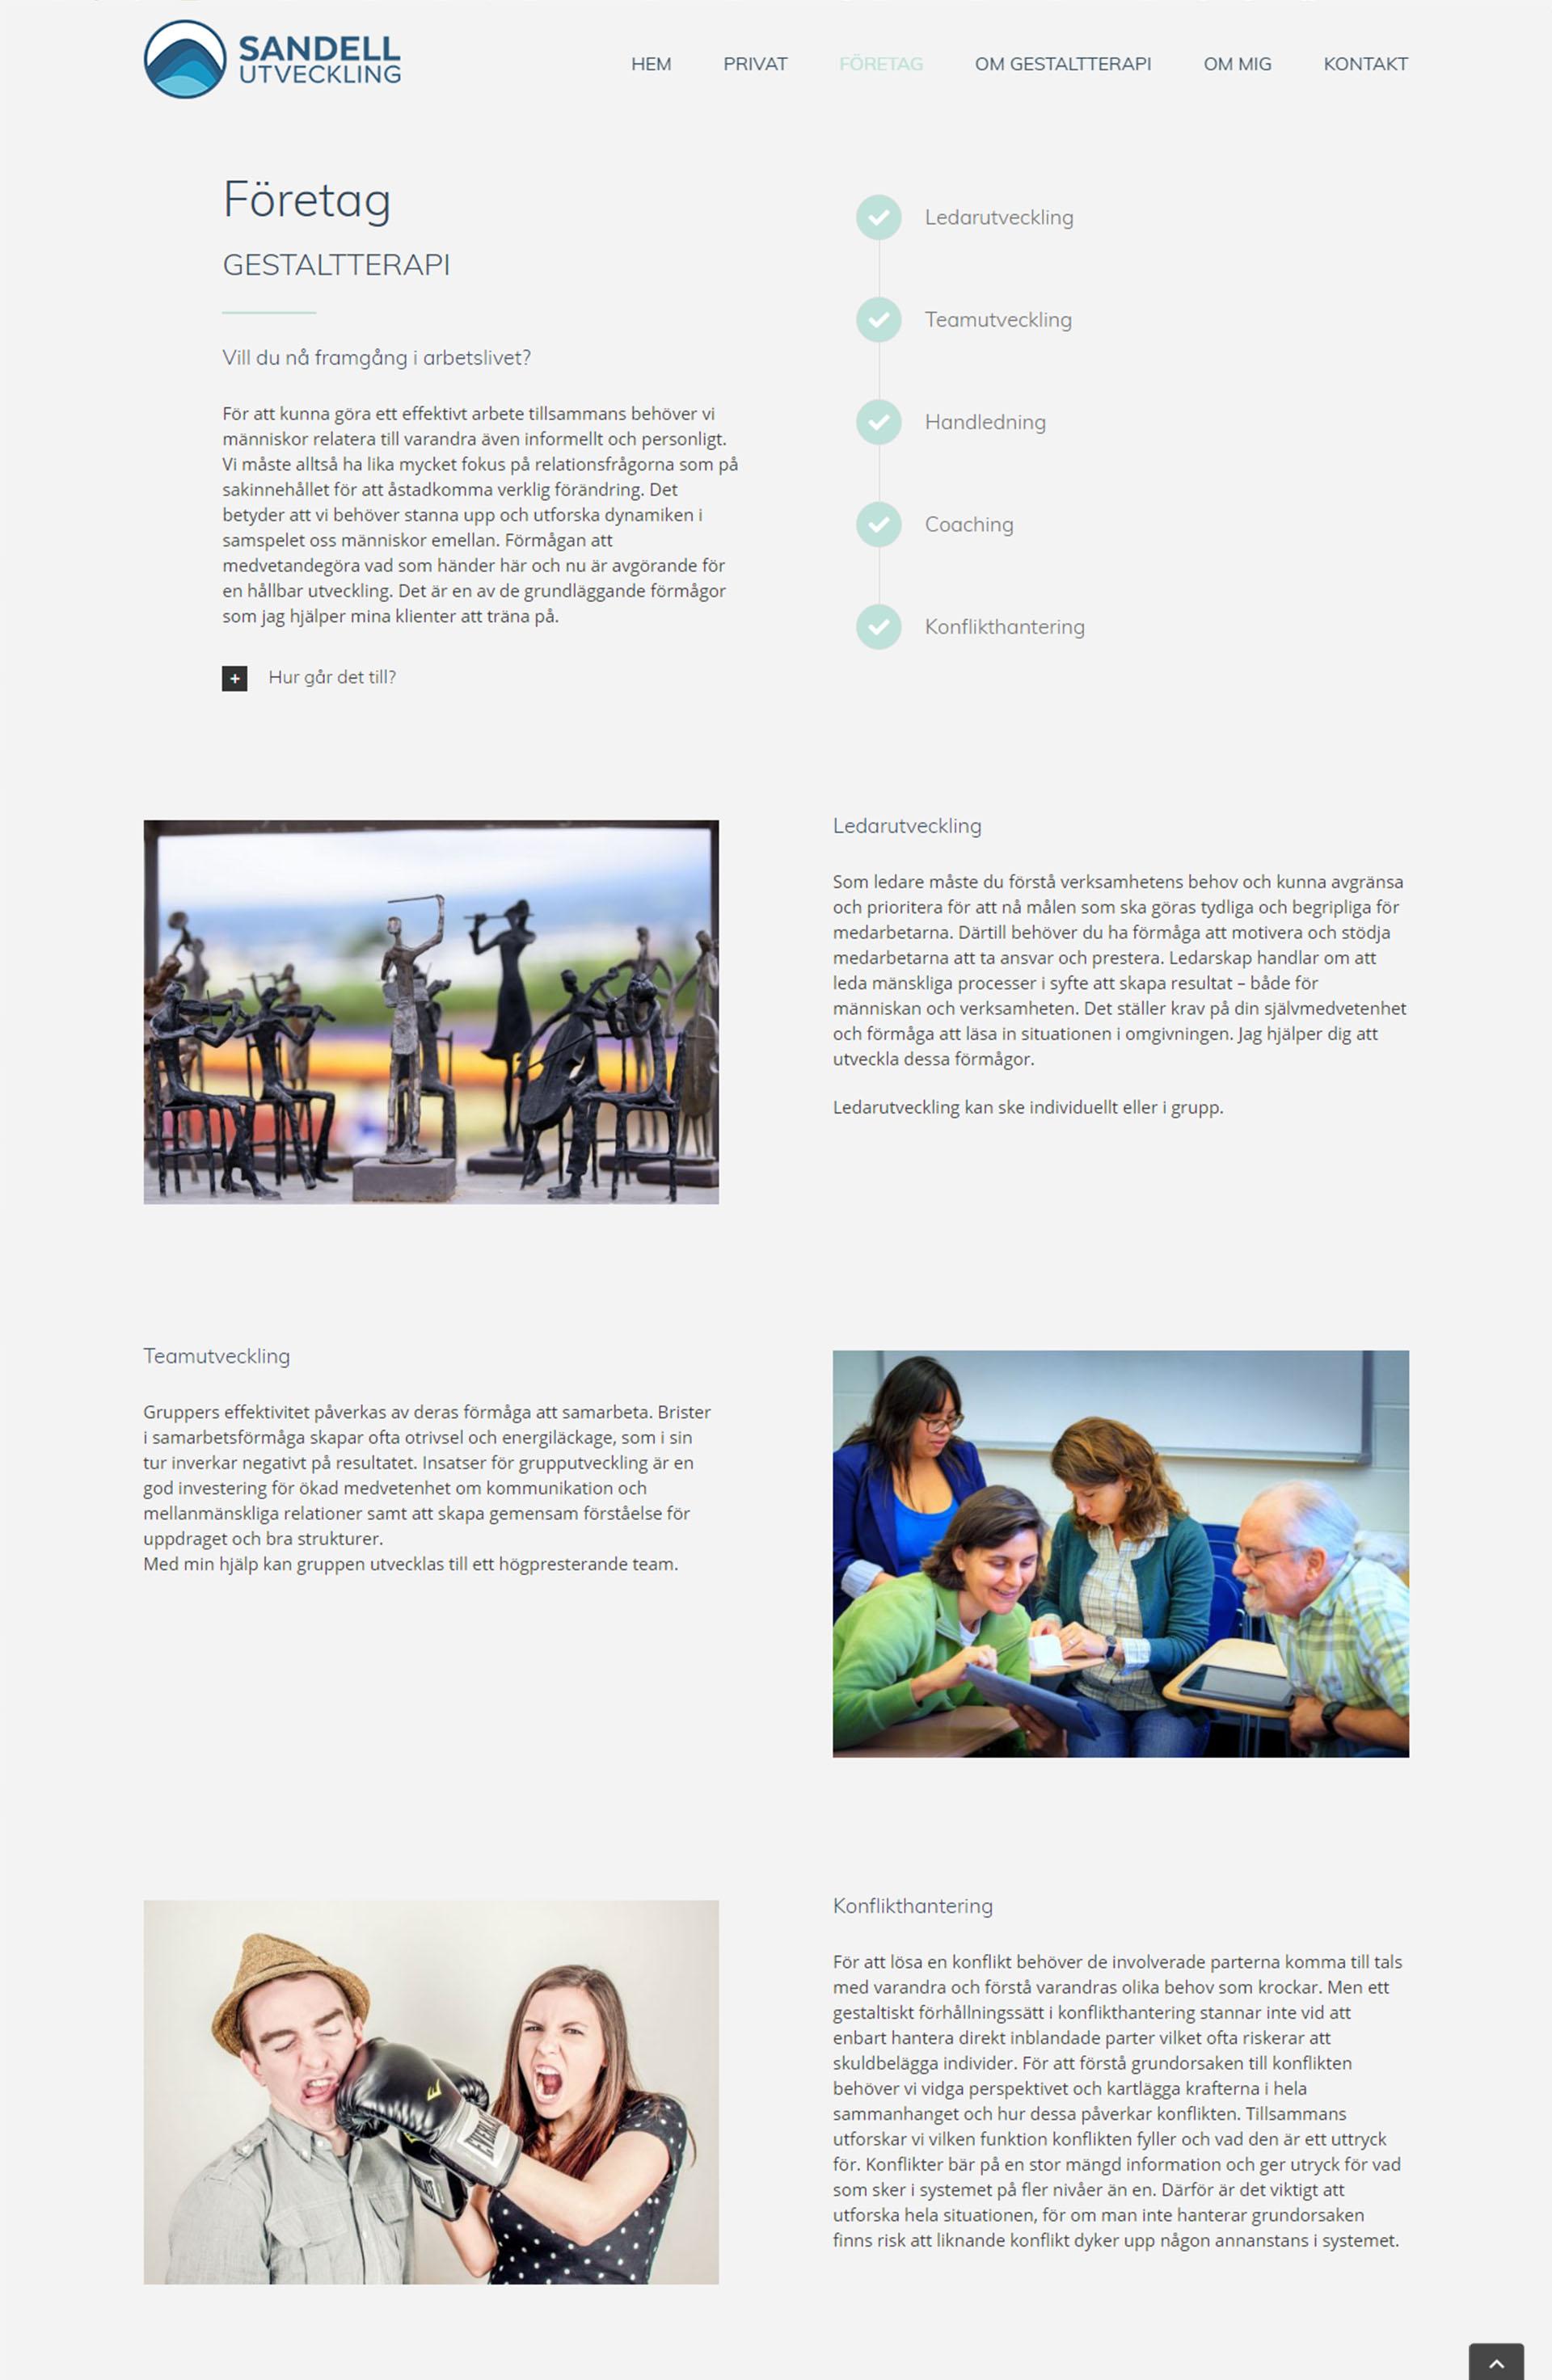 Webb Design anweb Sandell Utveckling